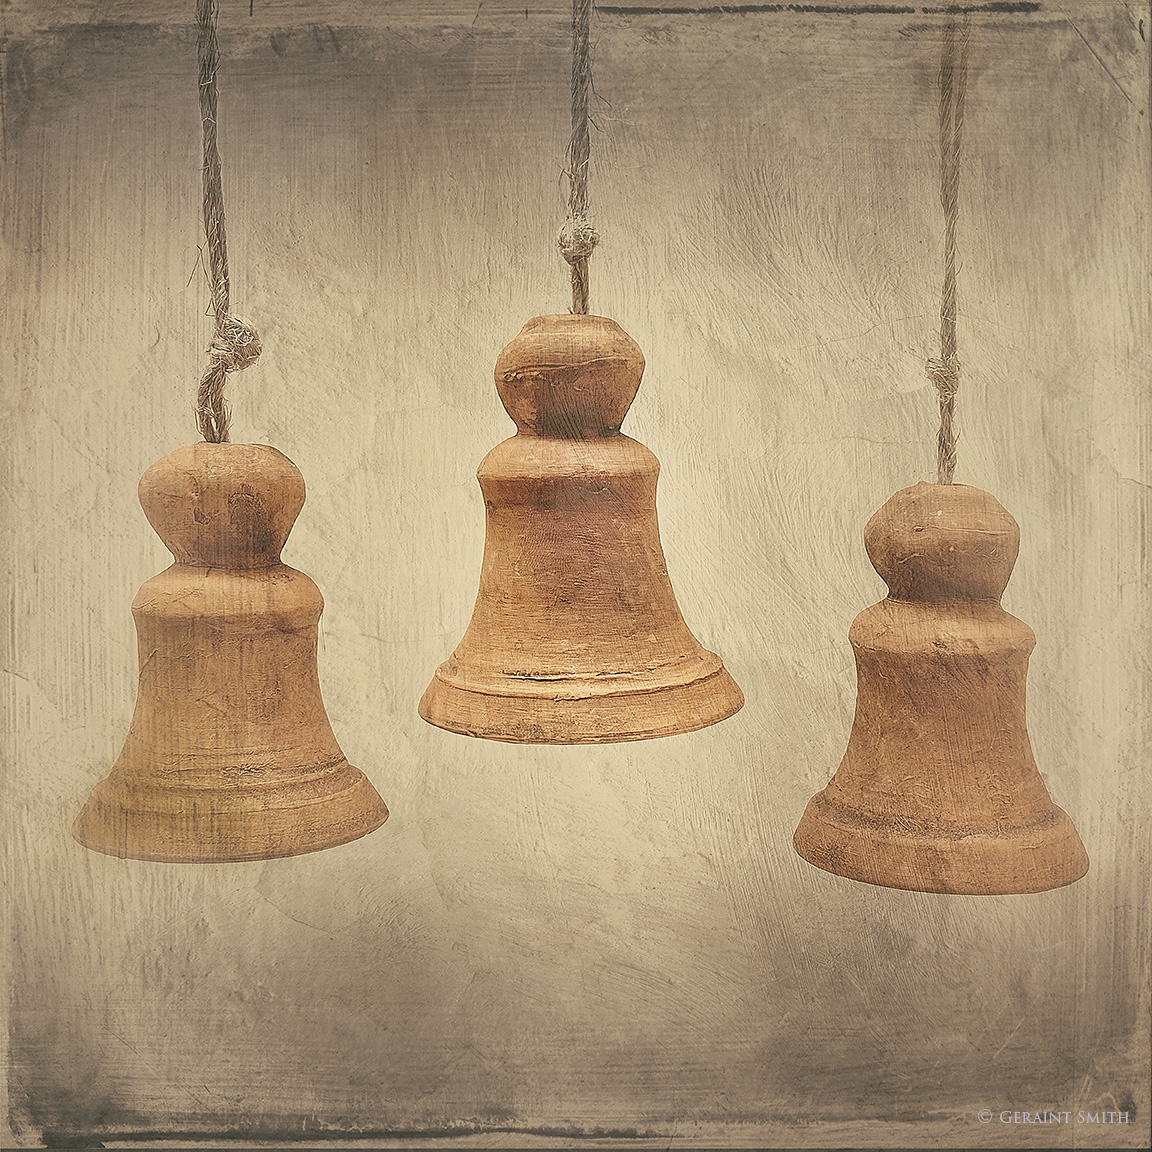 Three Clay Bells